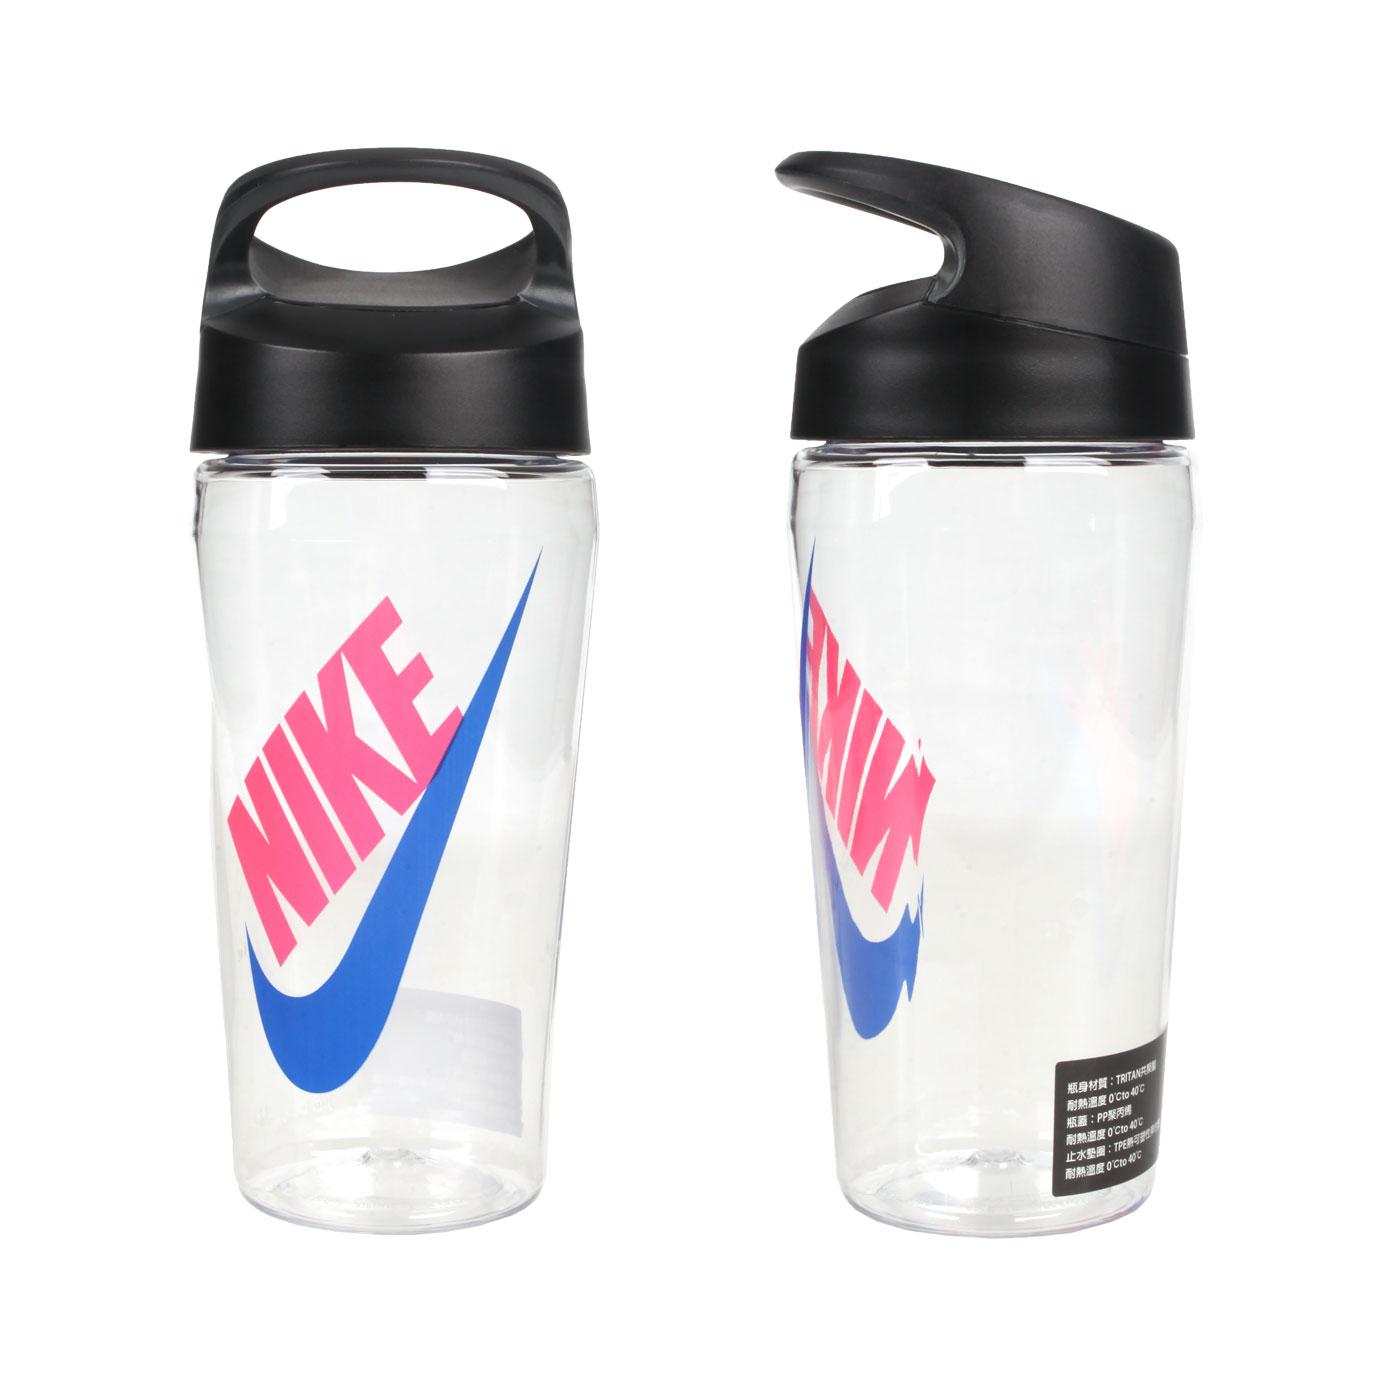 NIKE 16OZ 旋蓋式水壺 N000352393816 - 透明藍粉紅